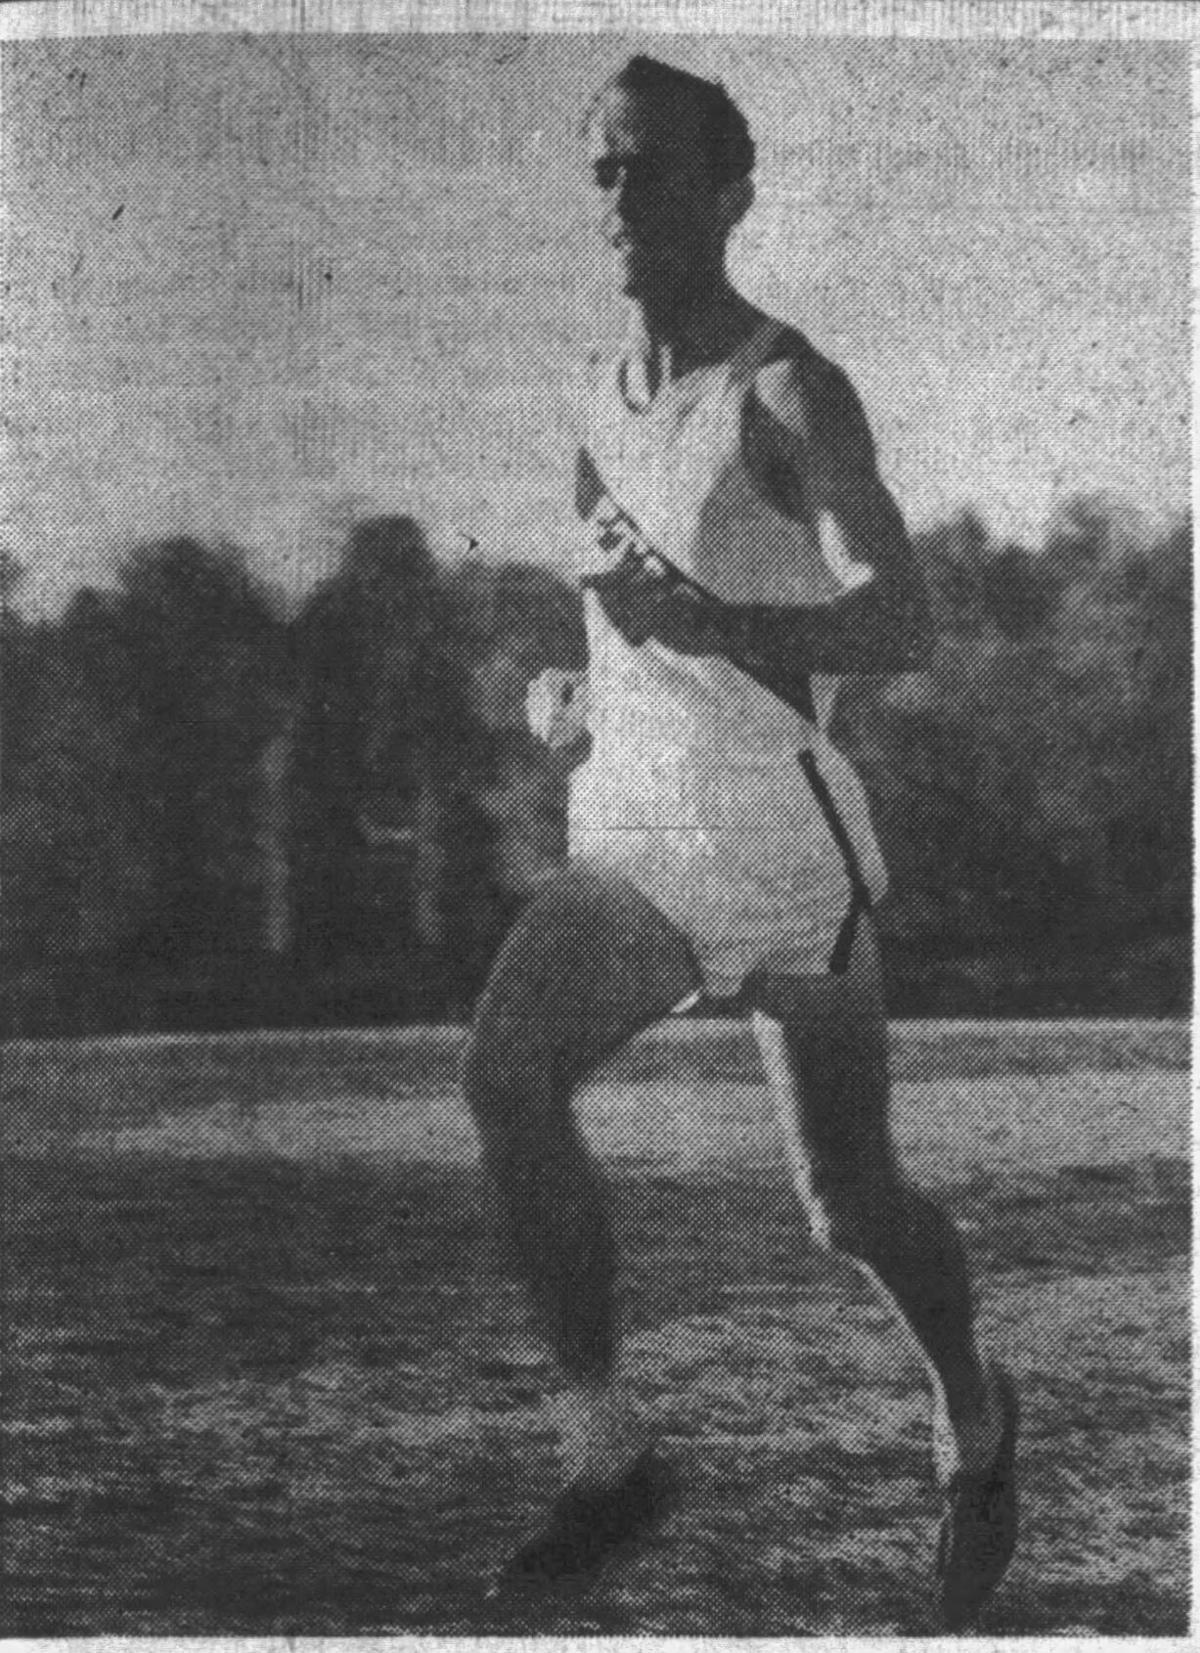 Kent Osborne running, 1956